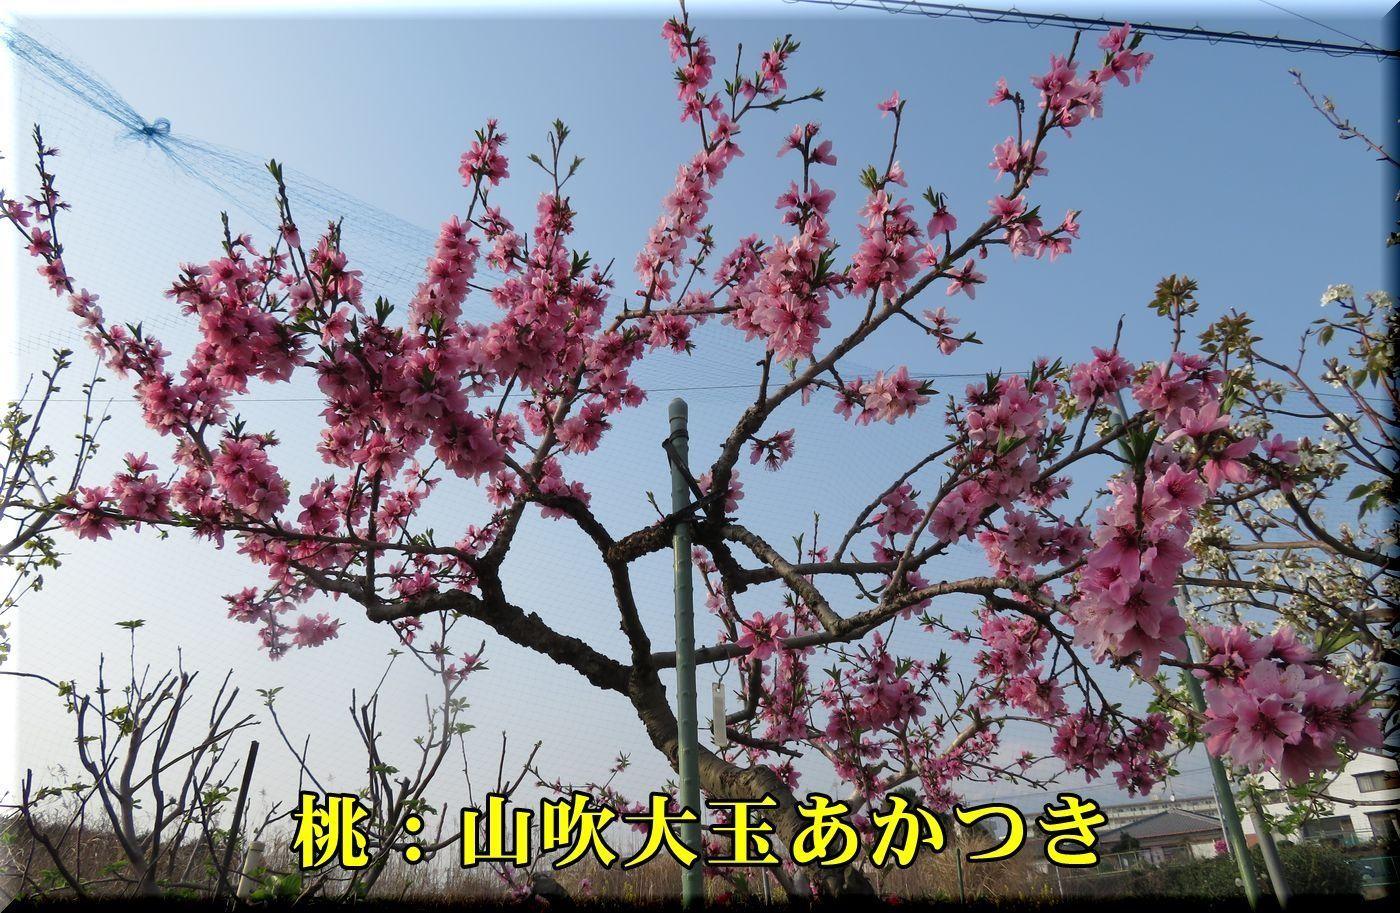 2yamabuki180402_053.jpg